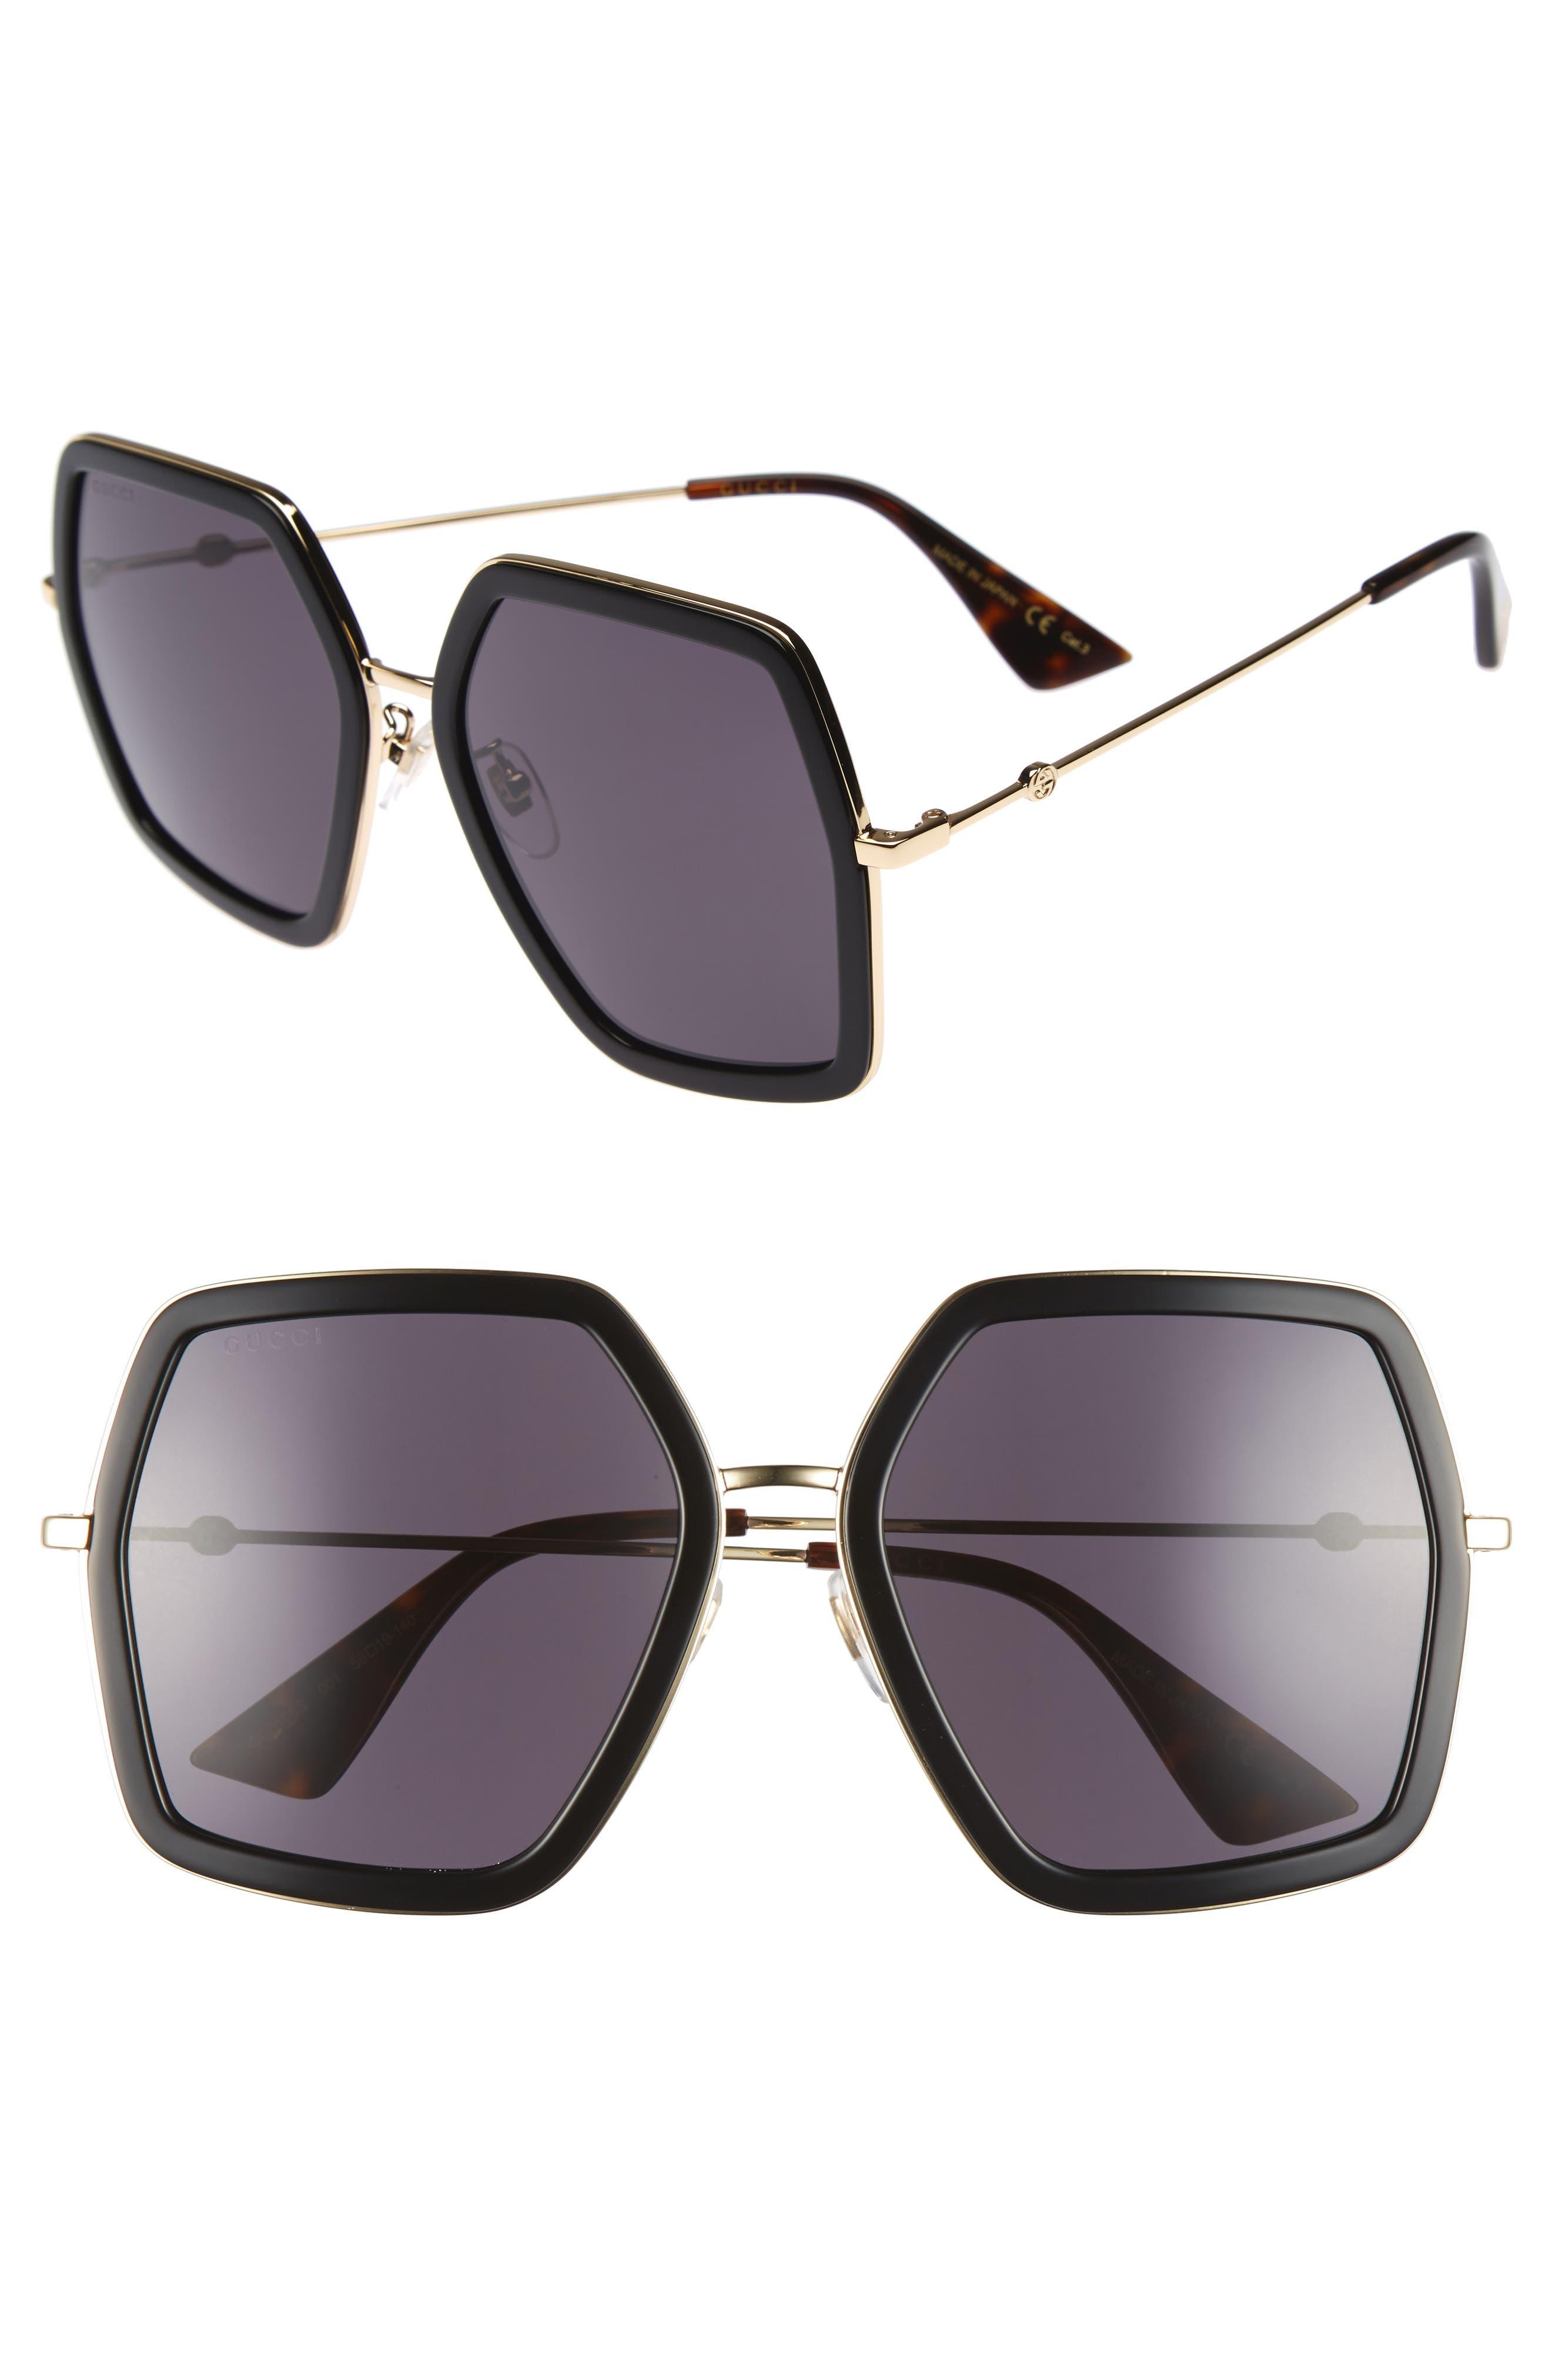 GUCCI, 56mm Sunglasses, Main thumbnail 1, color, BLACK/ GREY